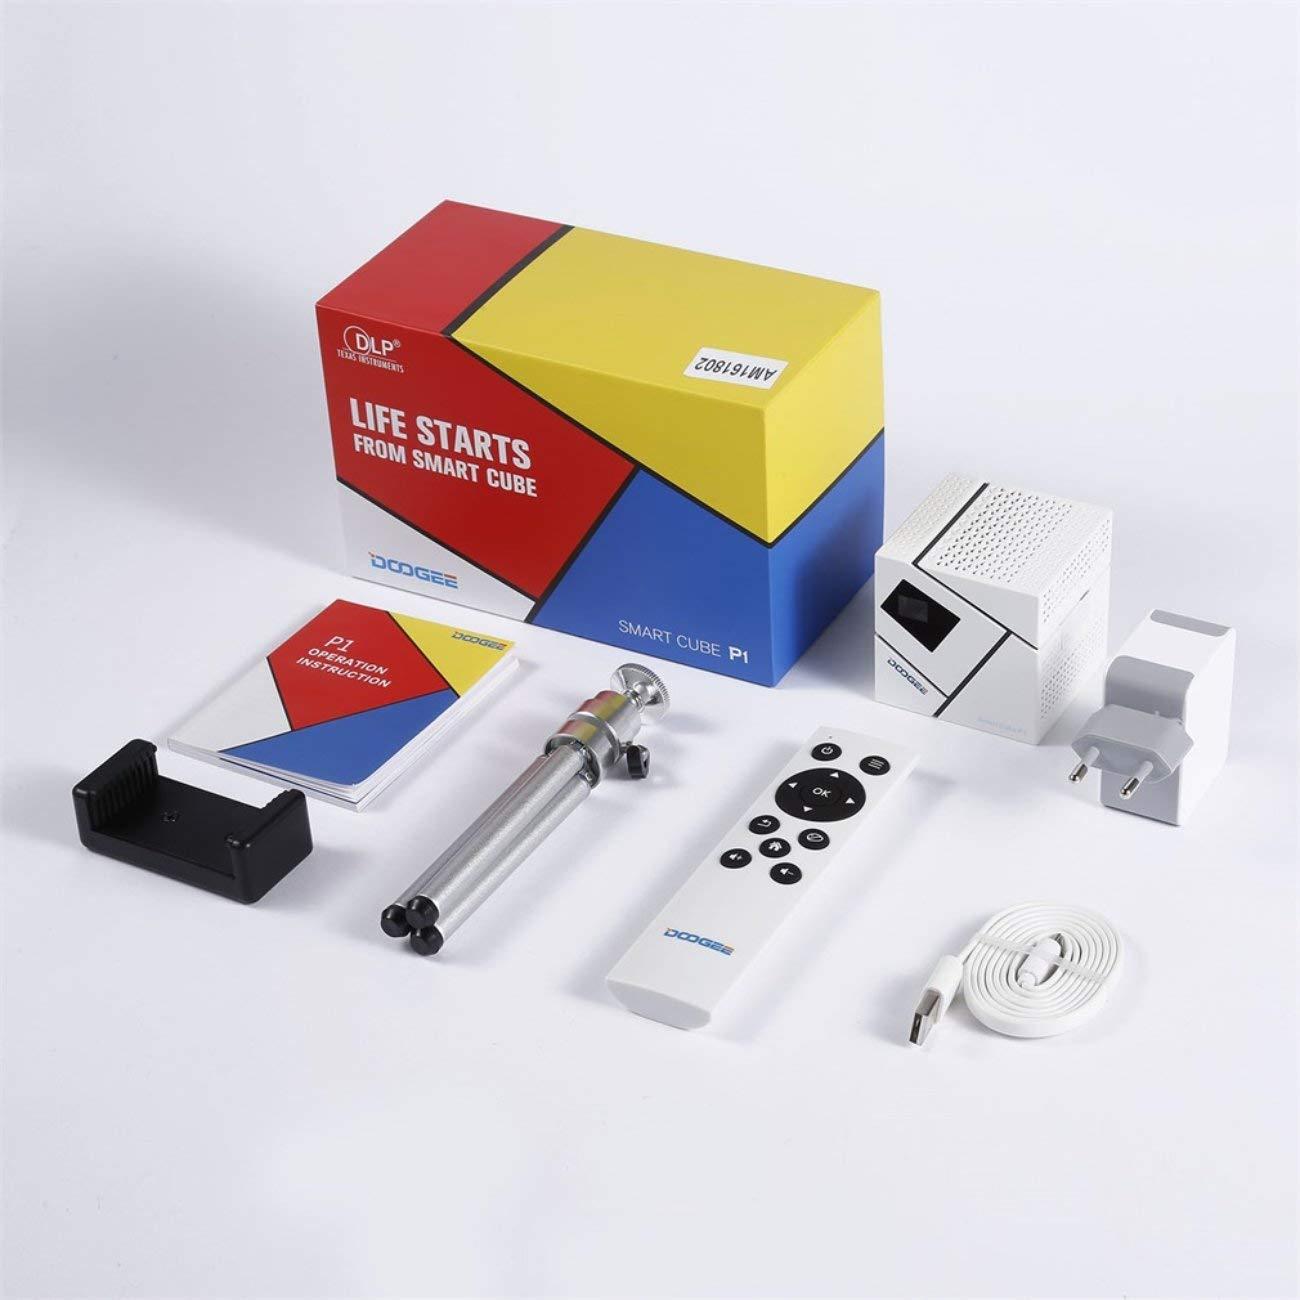 DOOGEE Smart Cube P1 FHD Mini LED 3D Inicio Juegos Proyector ...